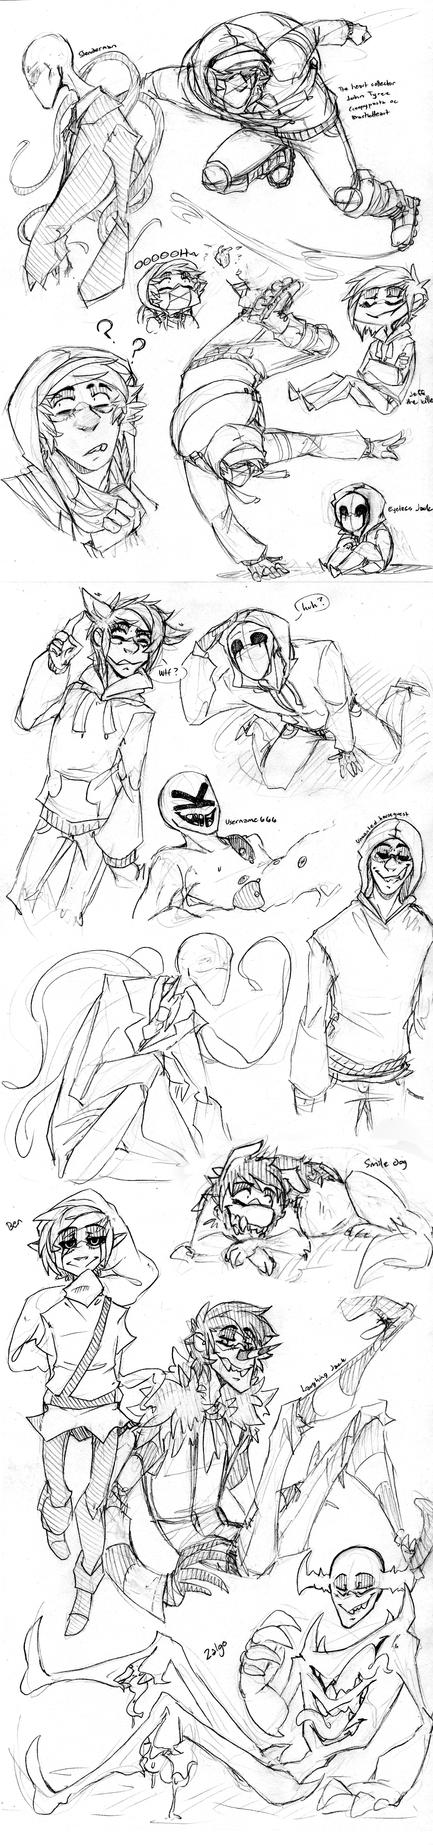 Creepypasta doodles by BlasticHeart